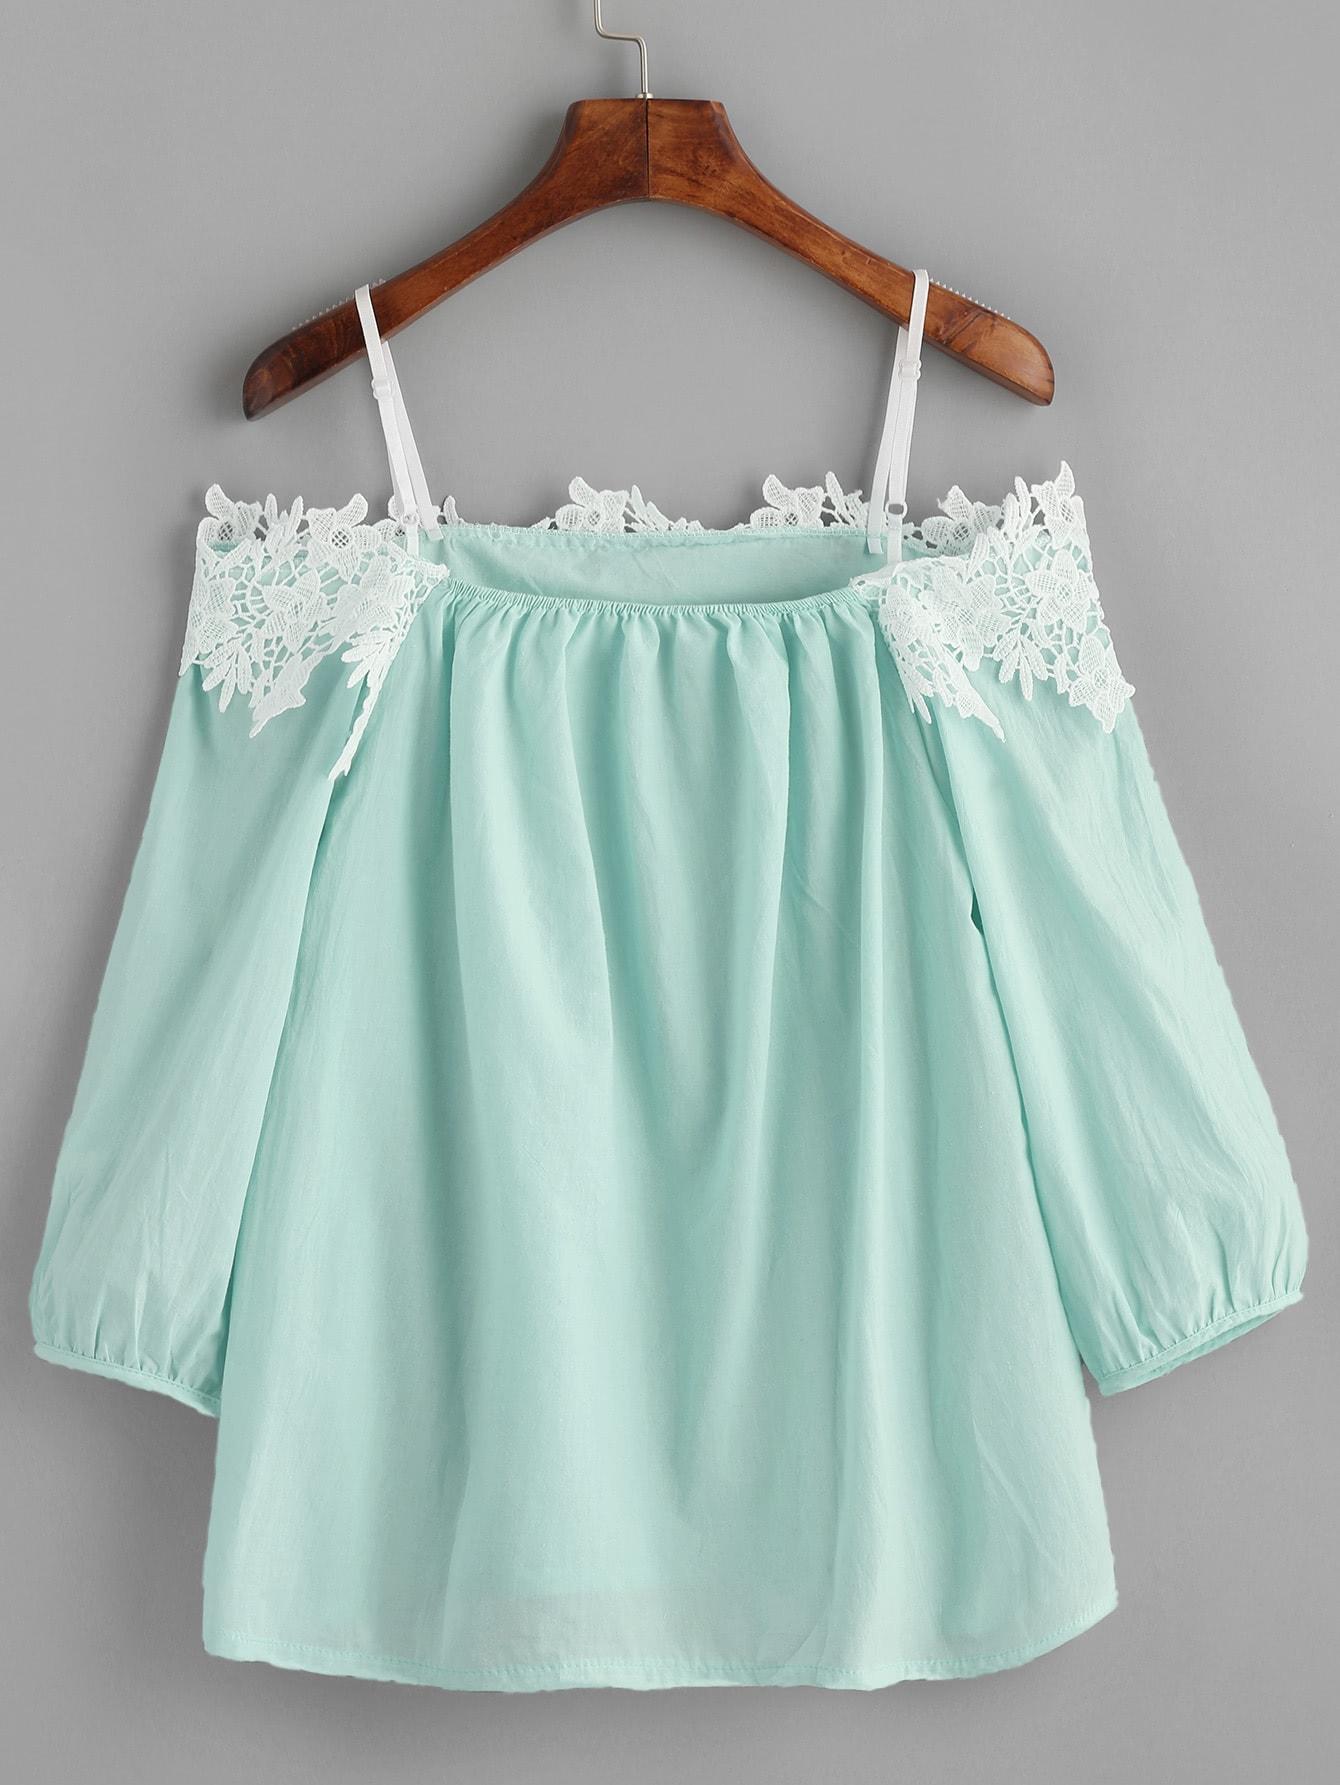 blouse170314107_2